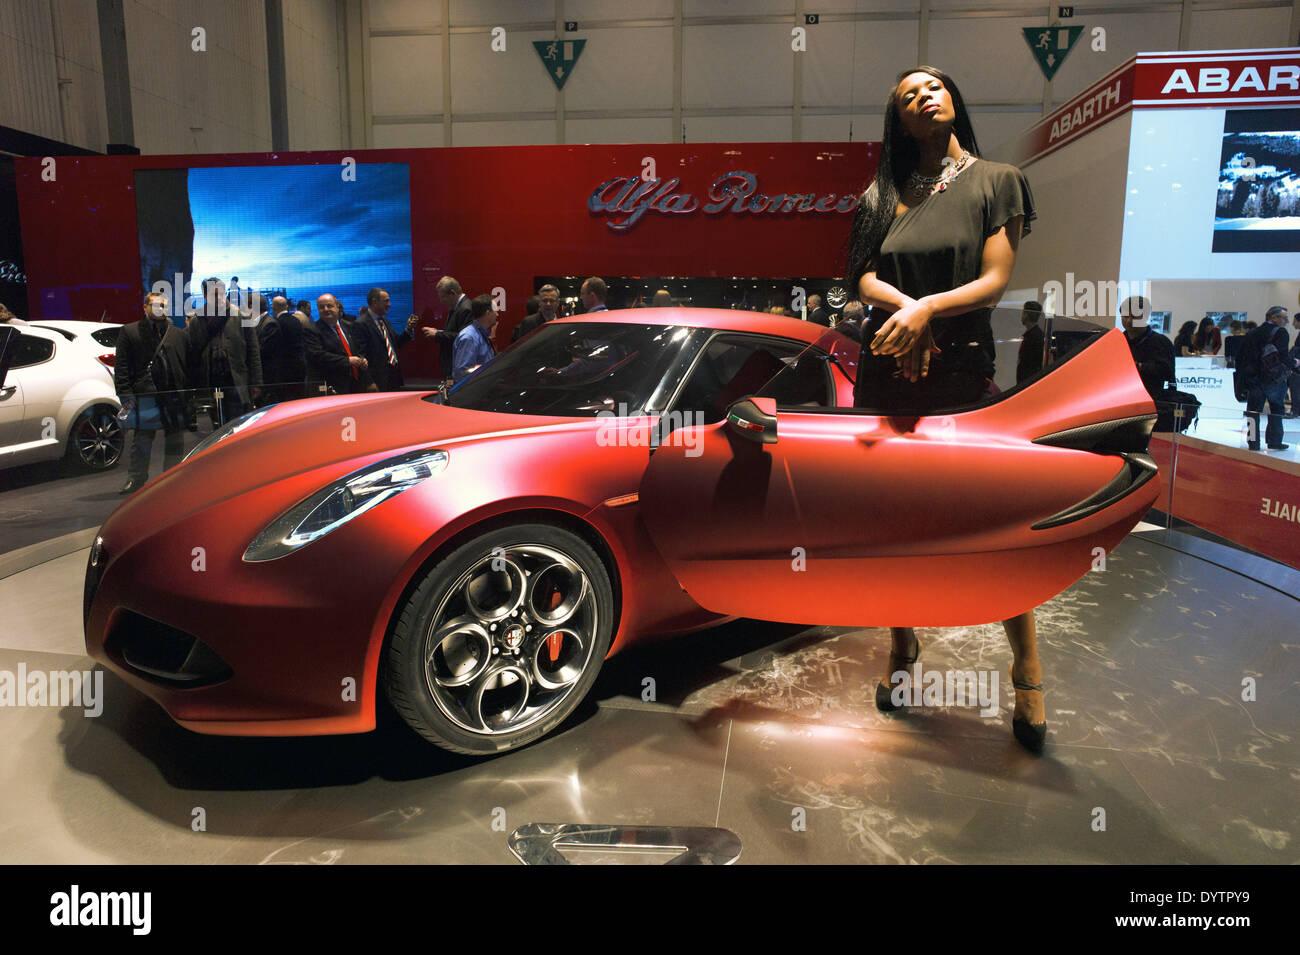 Alfa Romeo C4 Stock Photo 68771677 Alamy